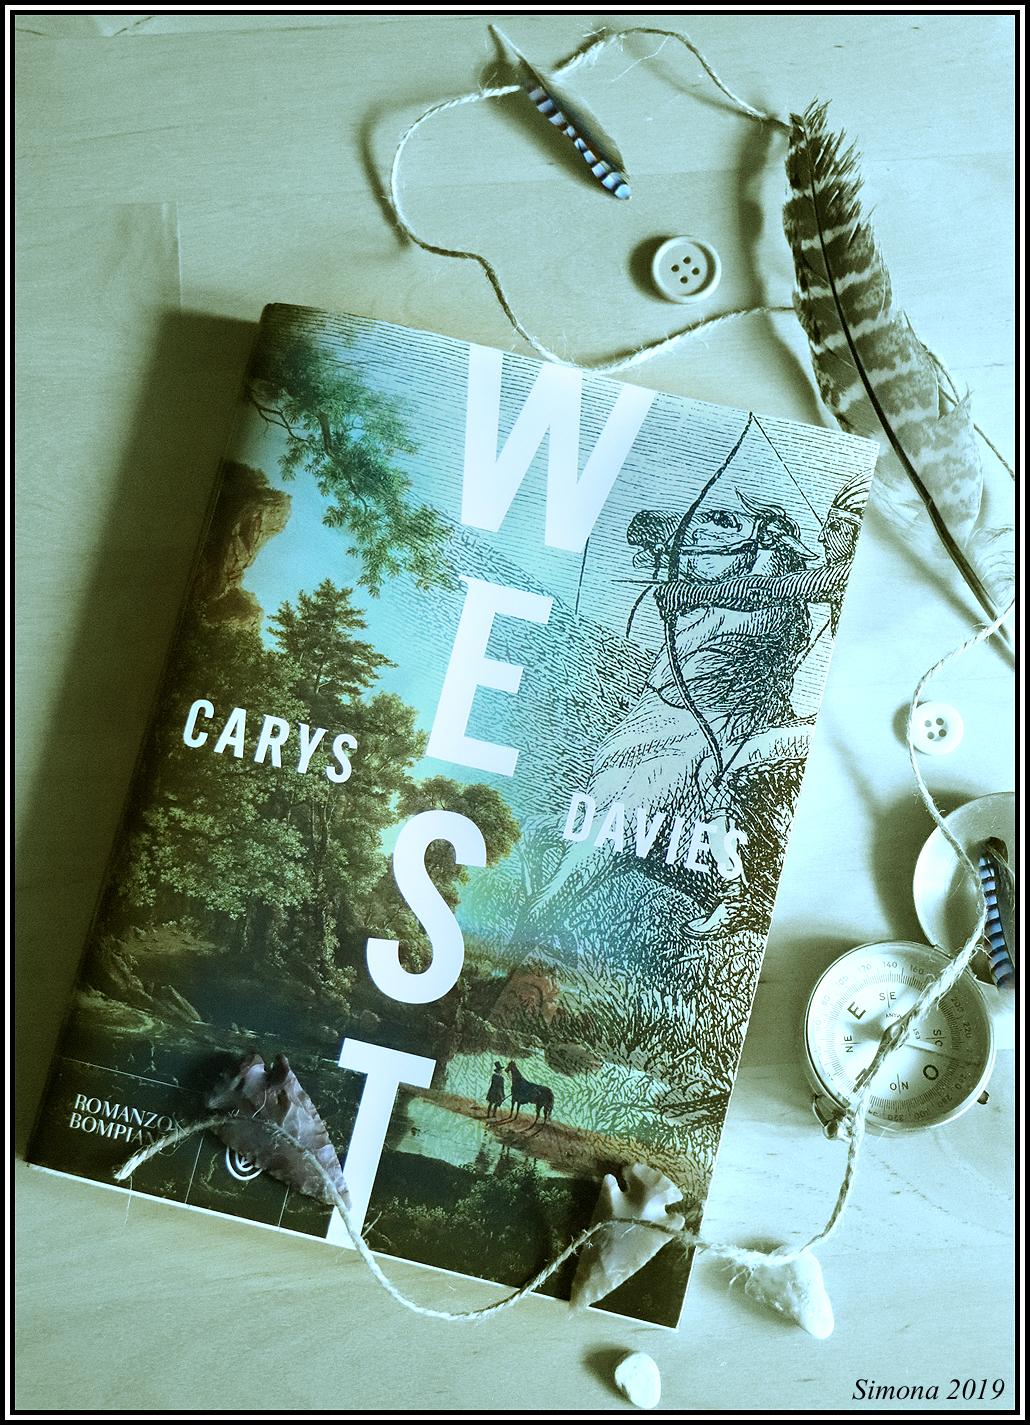 west copy.jpg